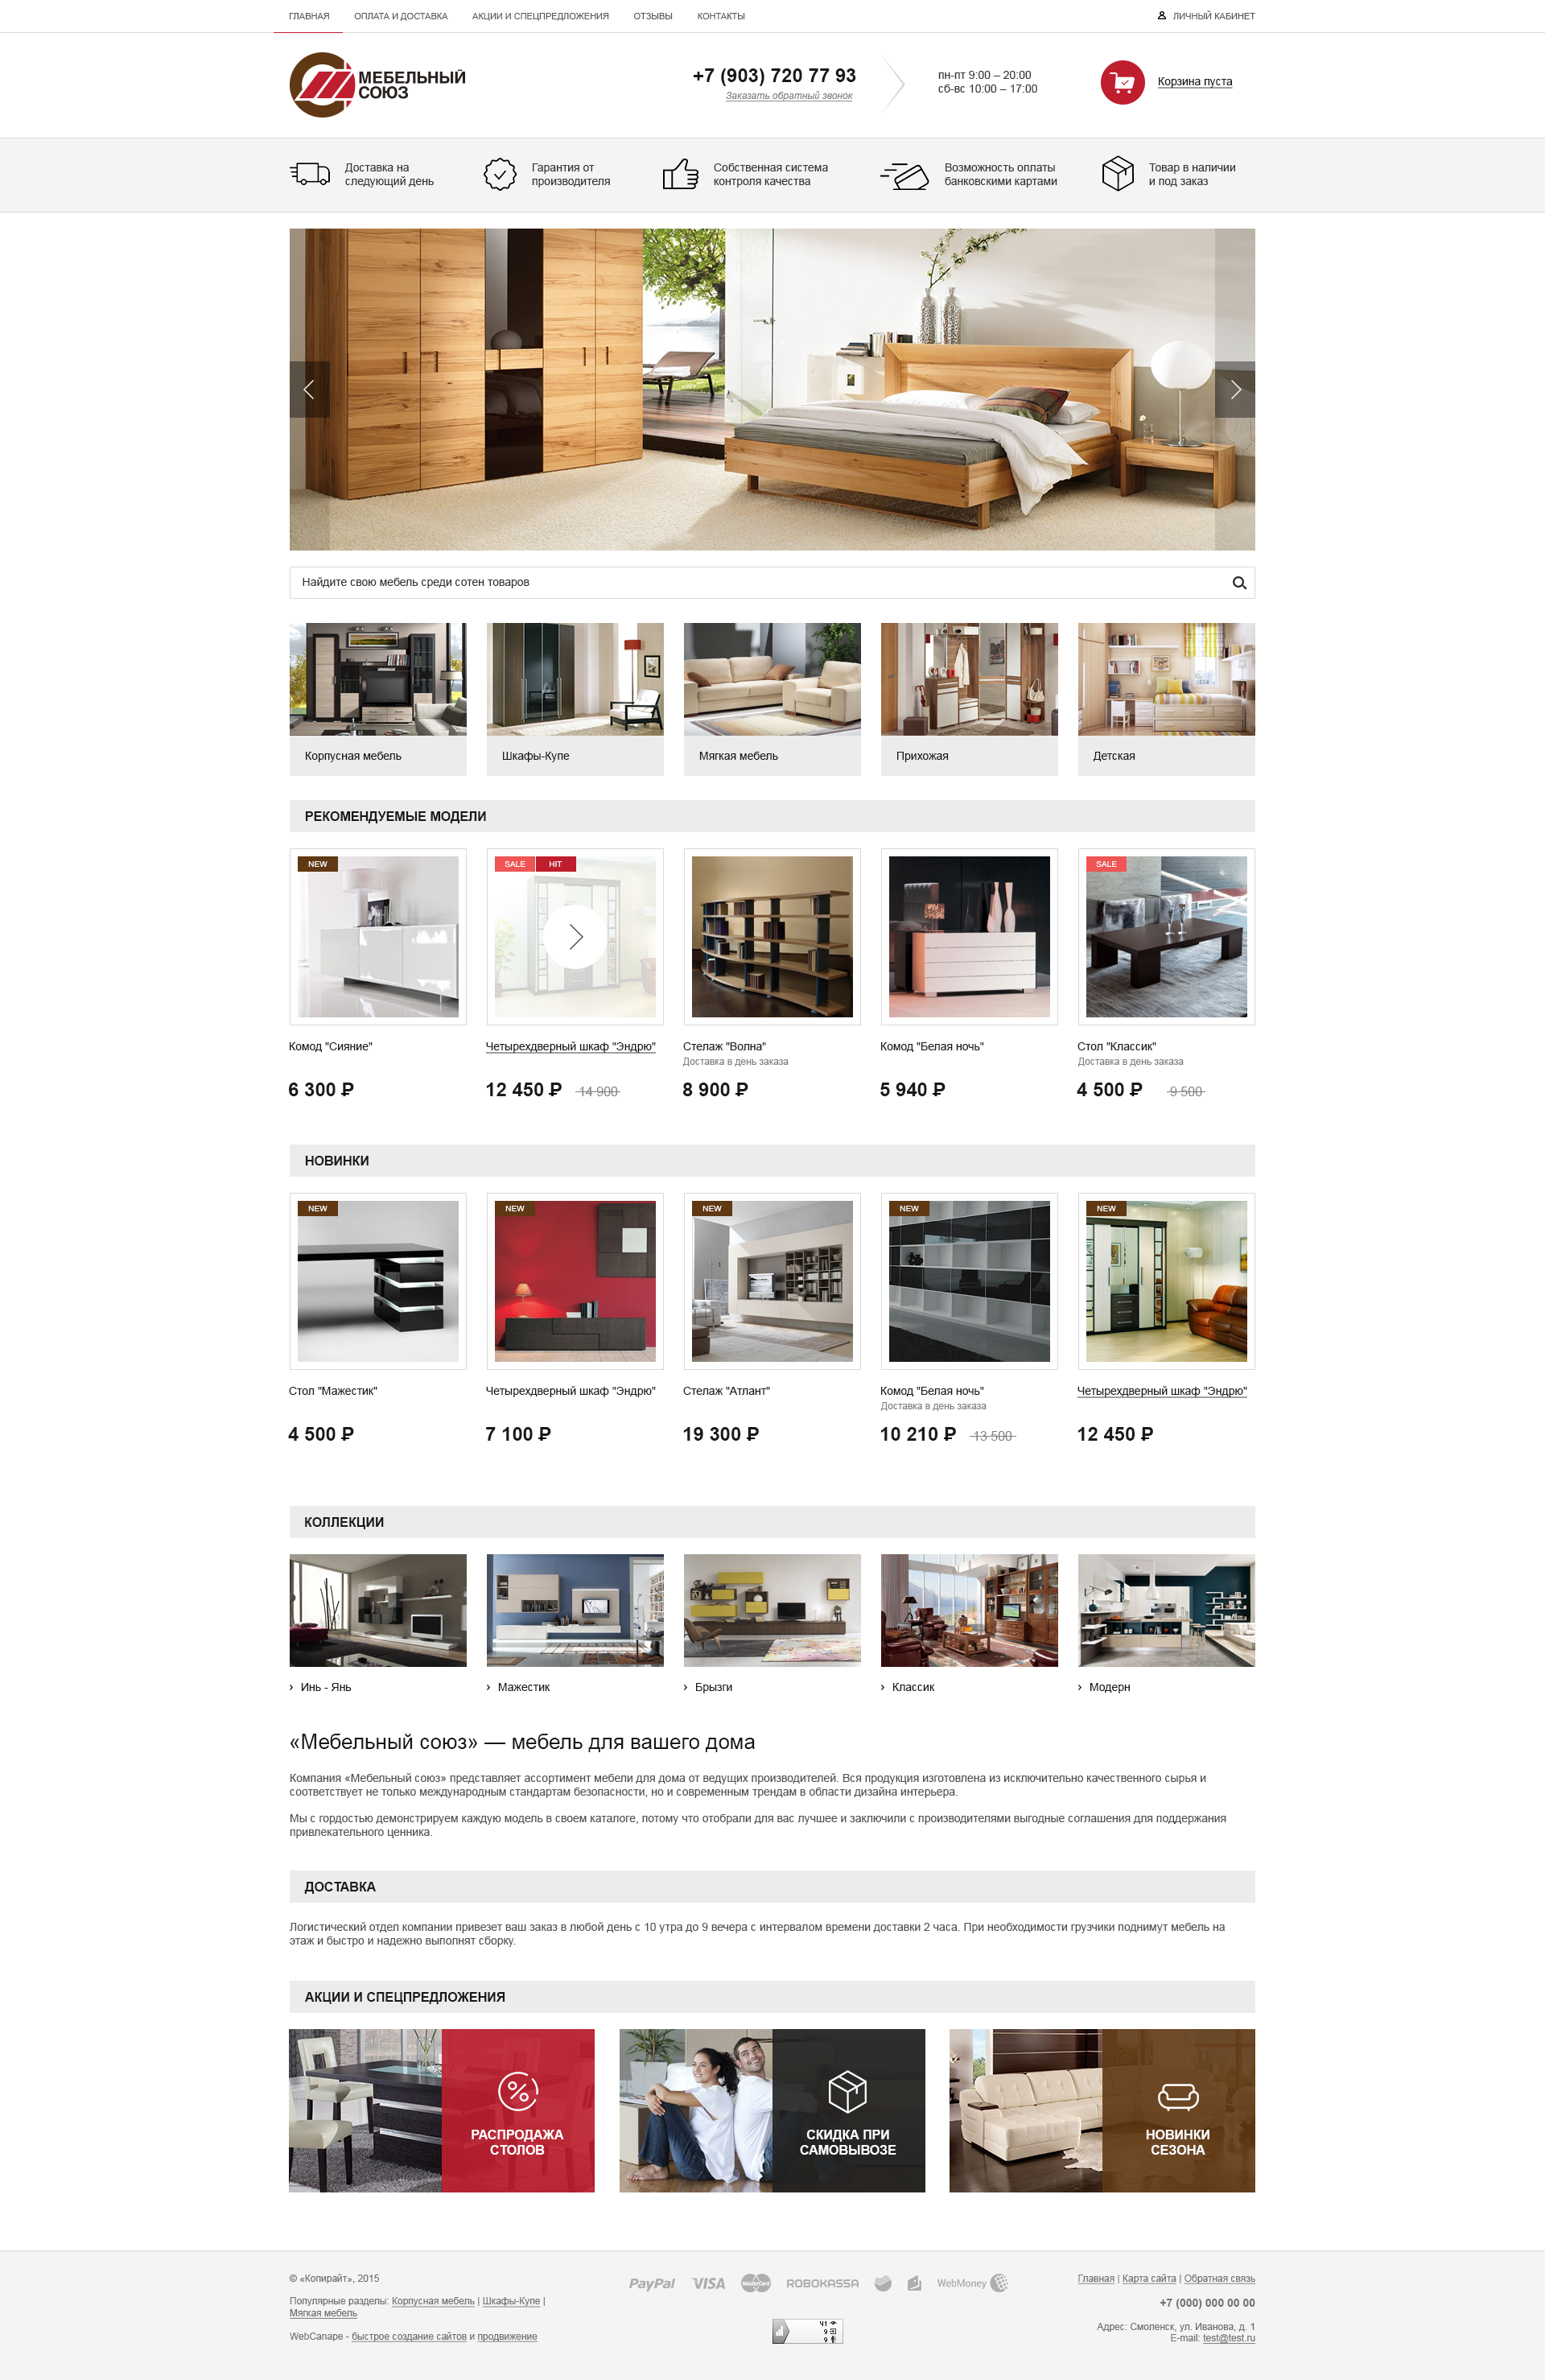 Разработка интернет-магазина мебели на основе шаблона готового решения